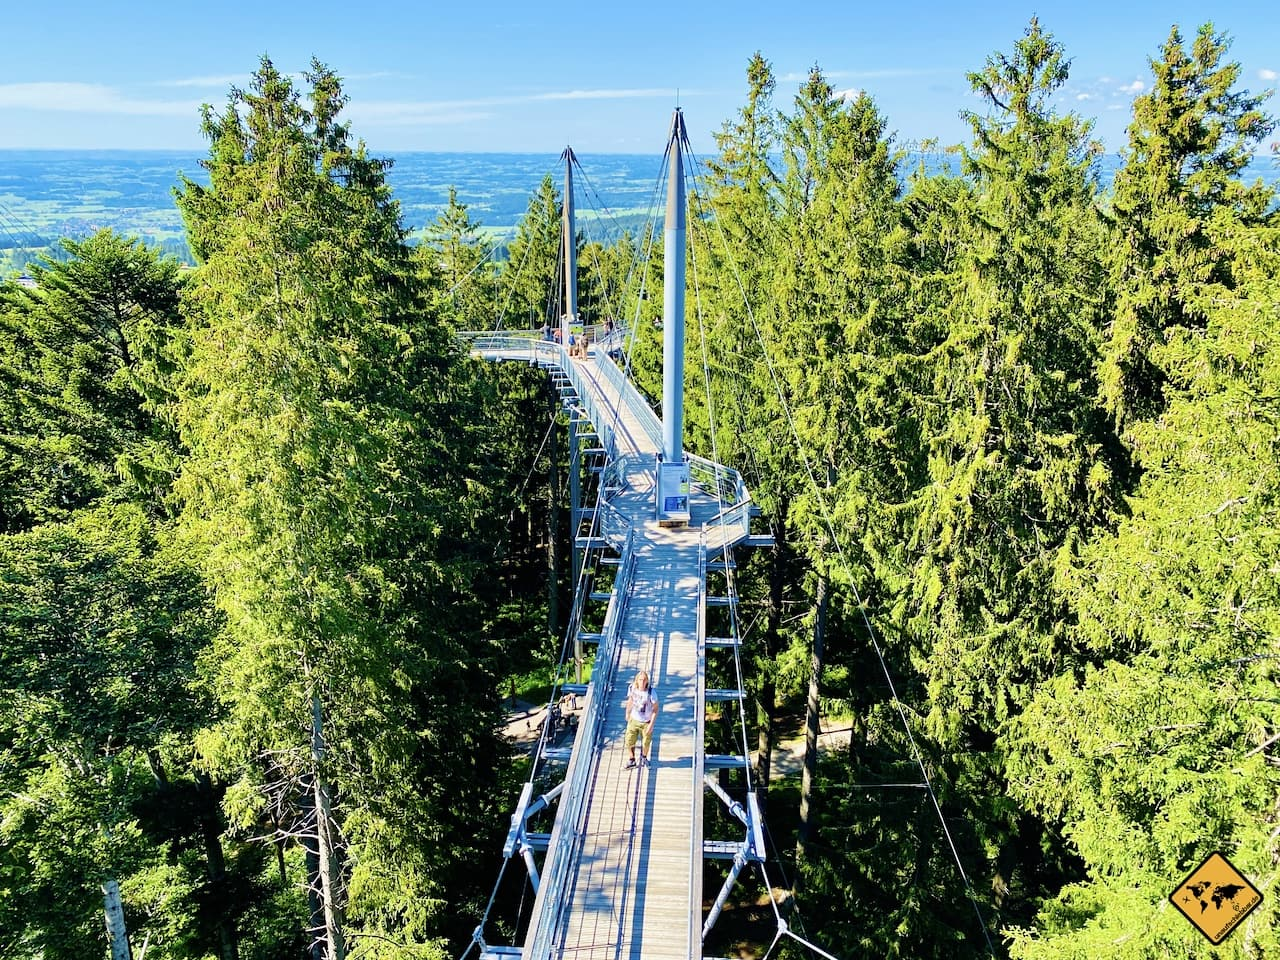 Skywalk Allgäu Hängebrücke Ausblick Aussichtsturm